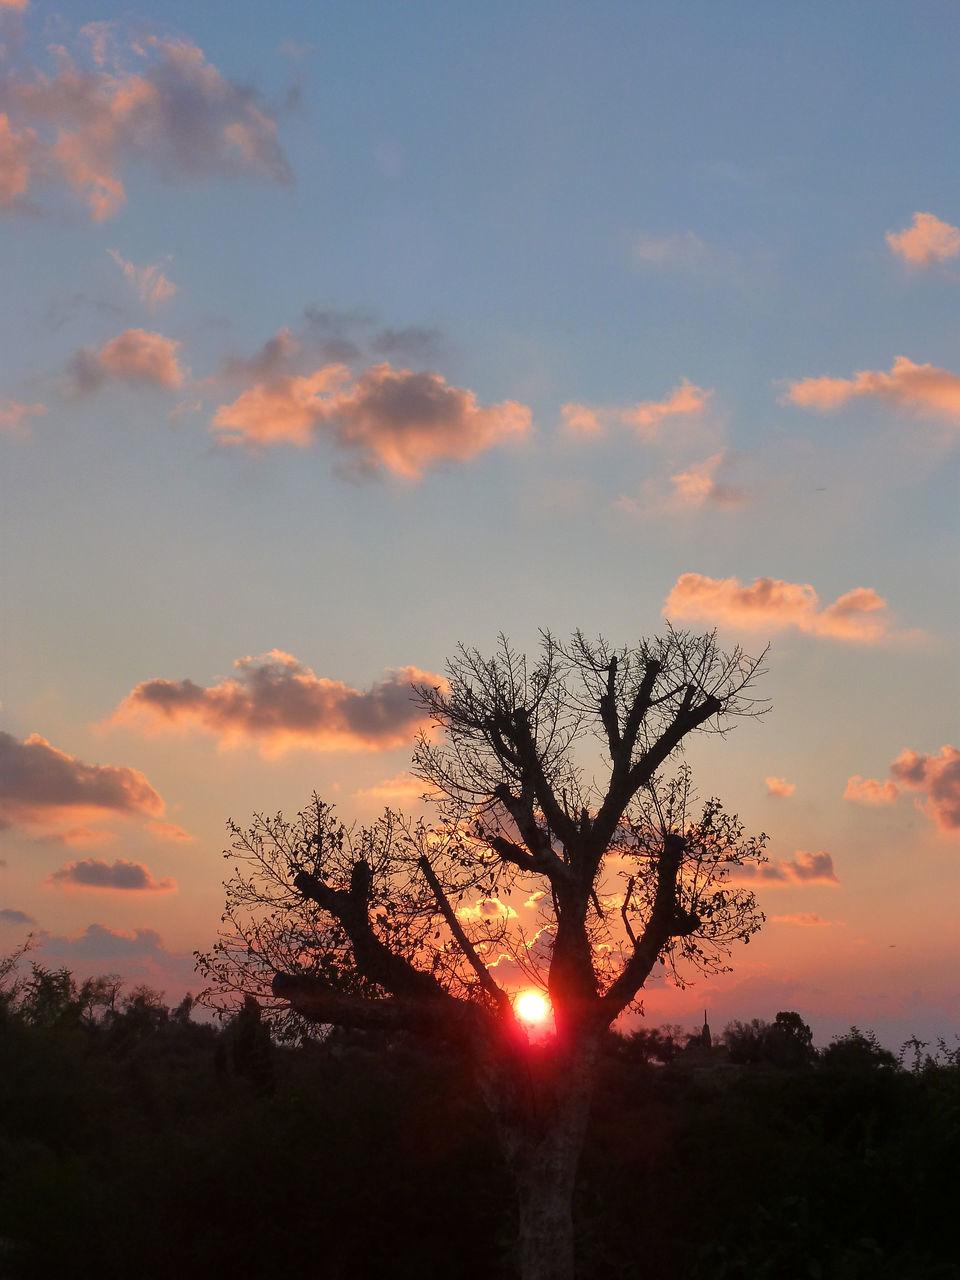 SILHOUETTE BARE TREE AGAINST SUNSET